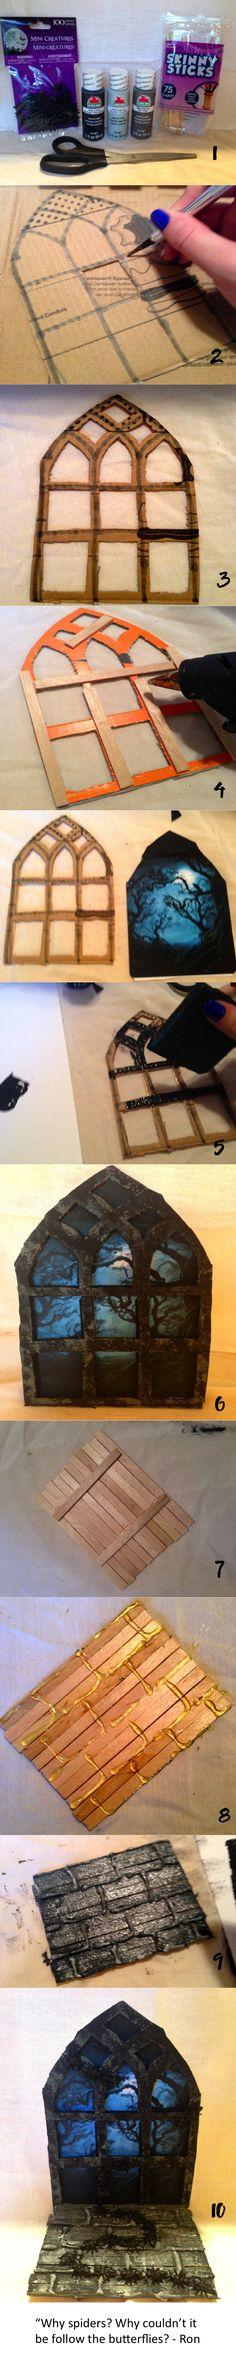 DIY HP Ornament Scuttling Spiders Scene